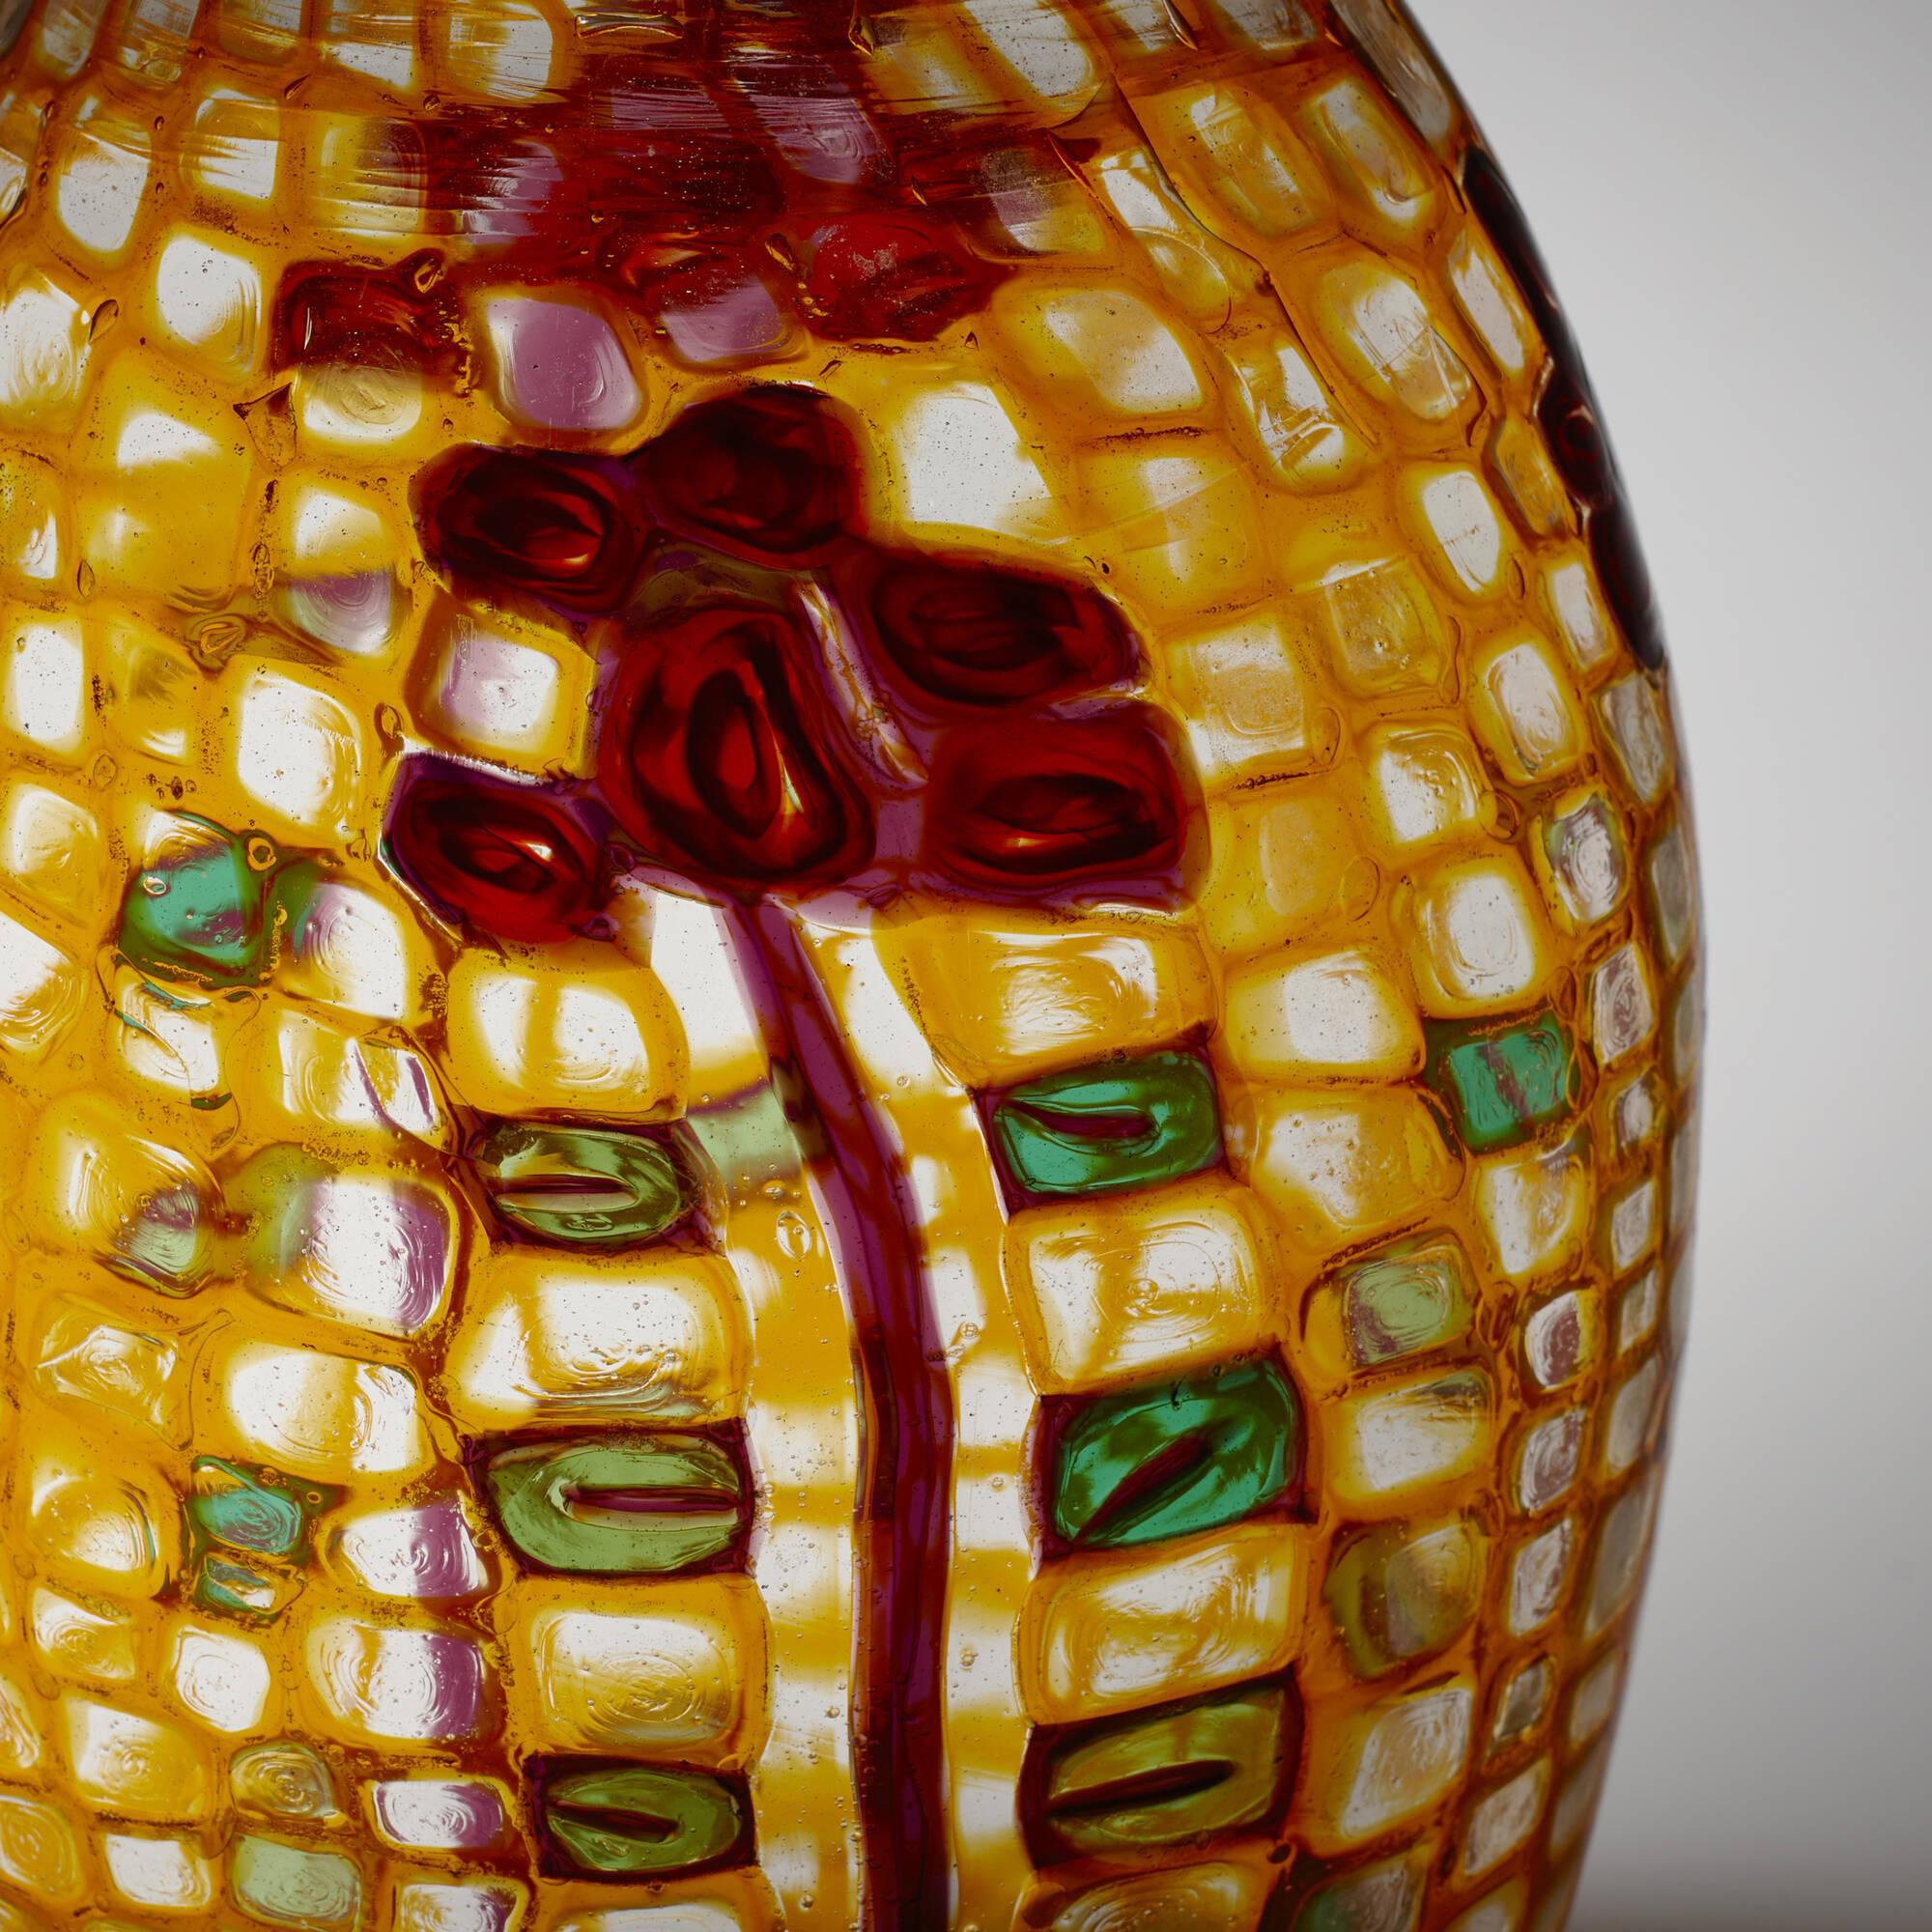 34: Ercole Barovier / Important Mosaico vase (3 of 4)